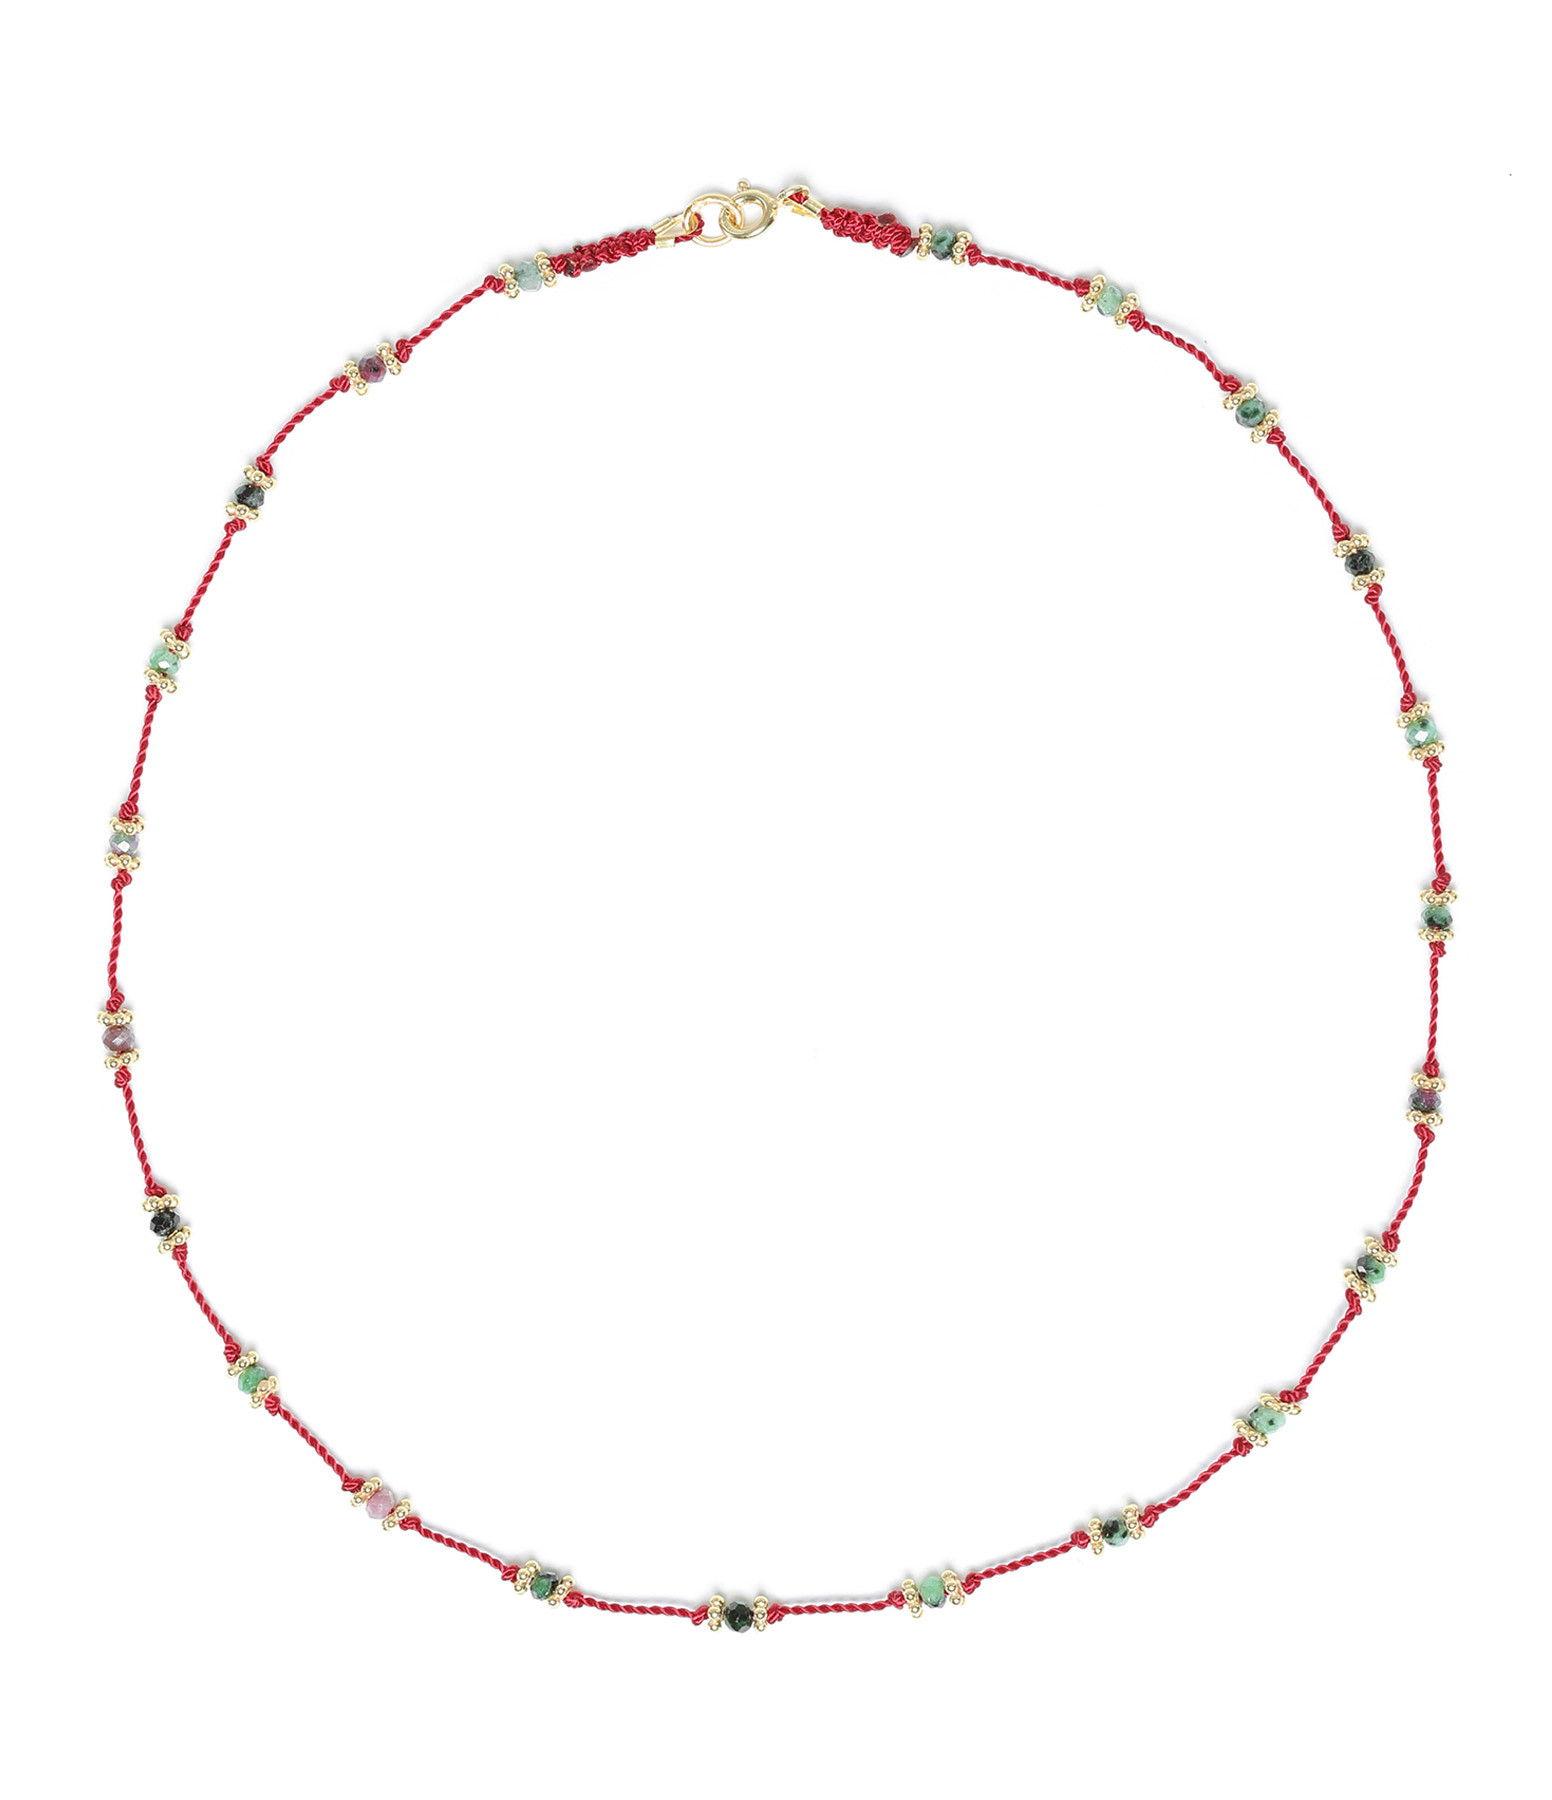 TITYARAVY - Collier Lotus Rouge Rubisoizite Plaqué Or